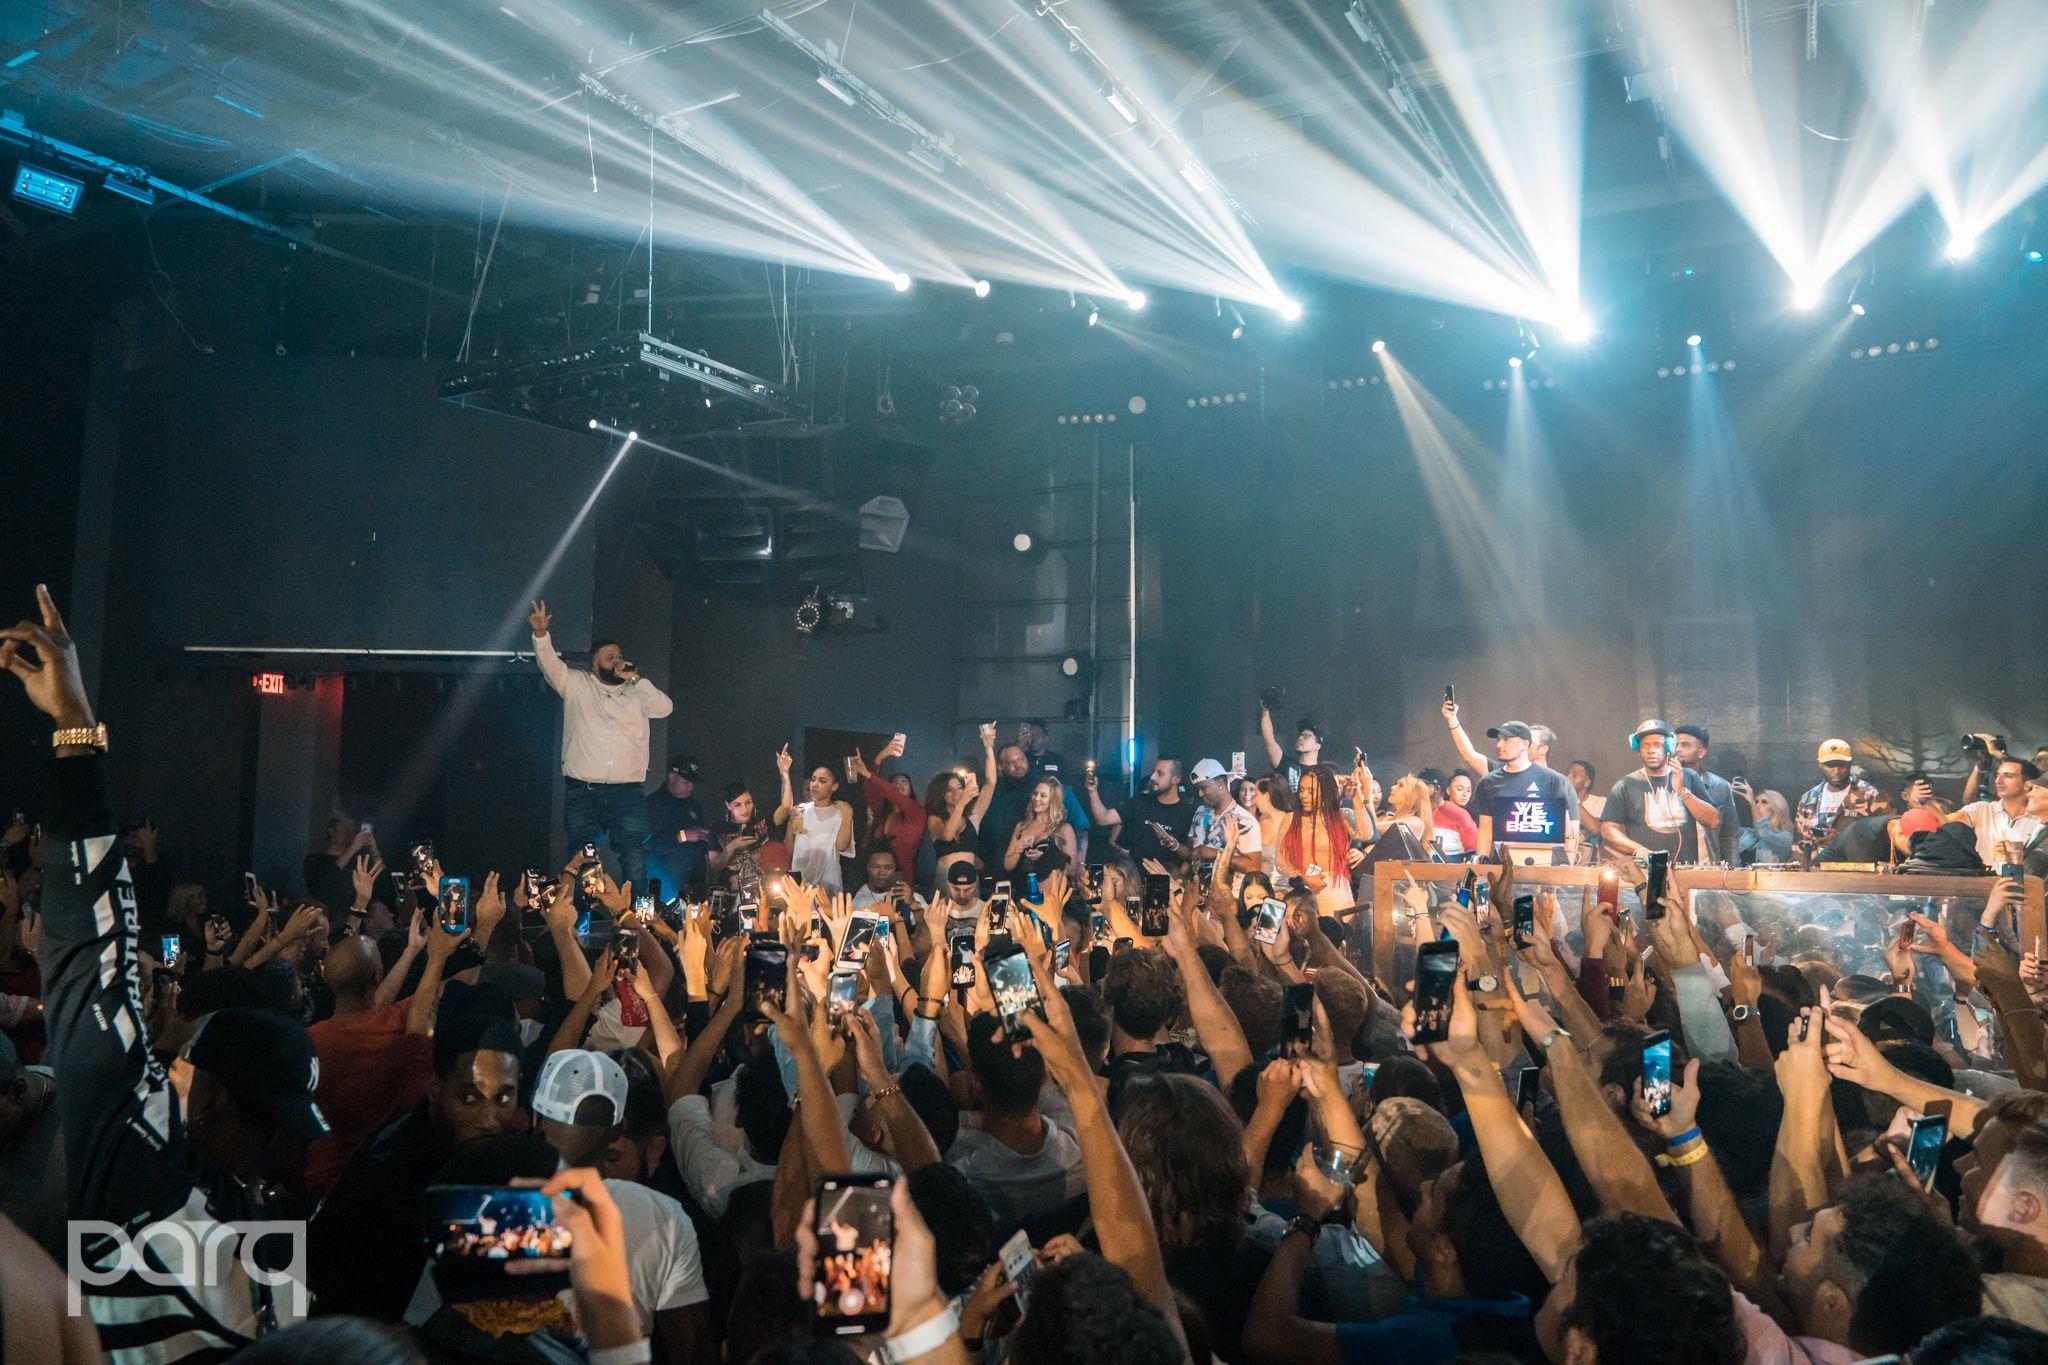 09.27.18 Parq - DJ Khaled-36.jpg